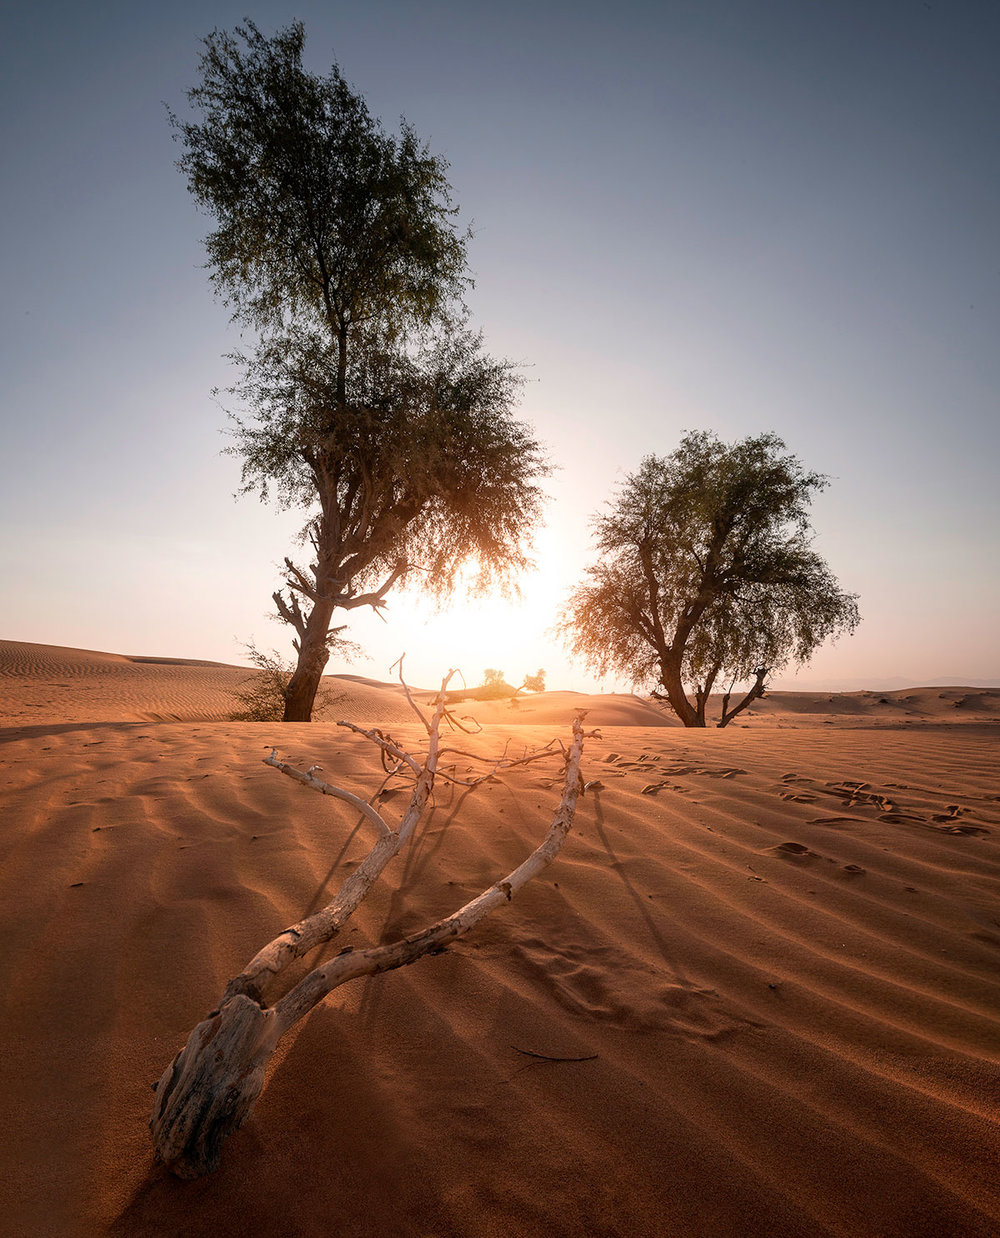 Maliha desert during sunrise